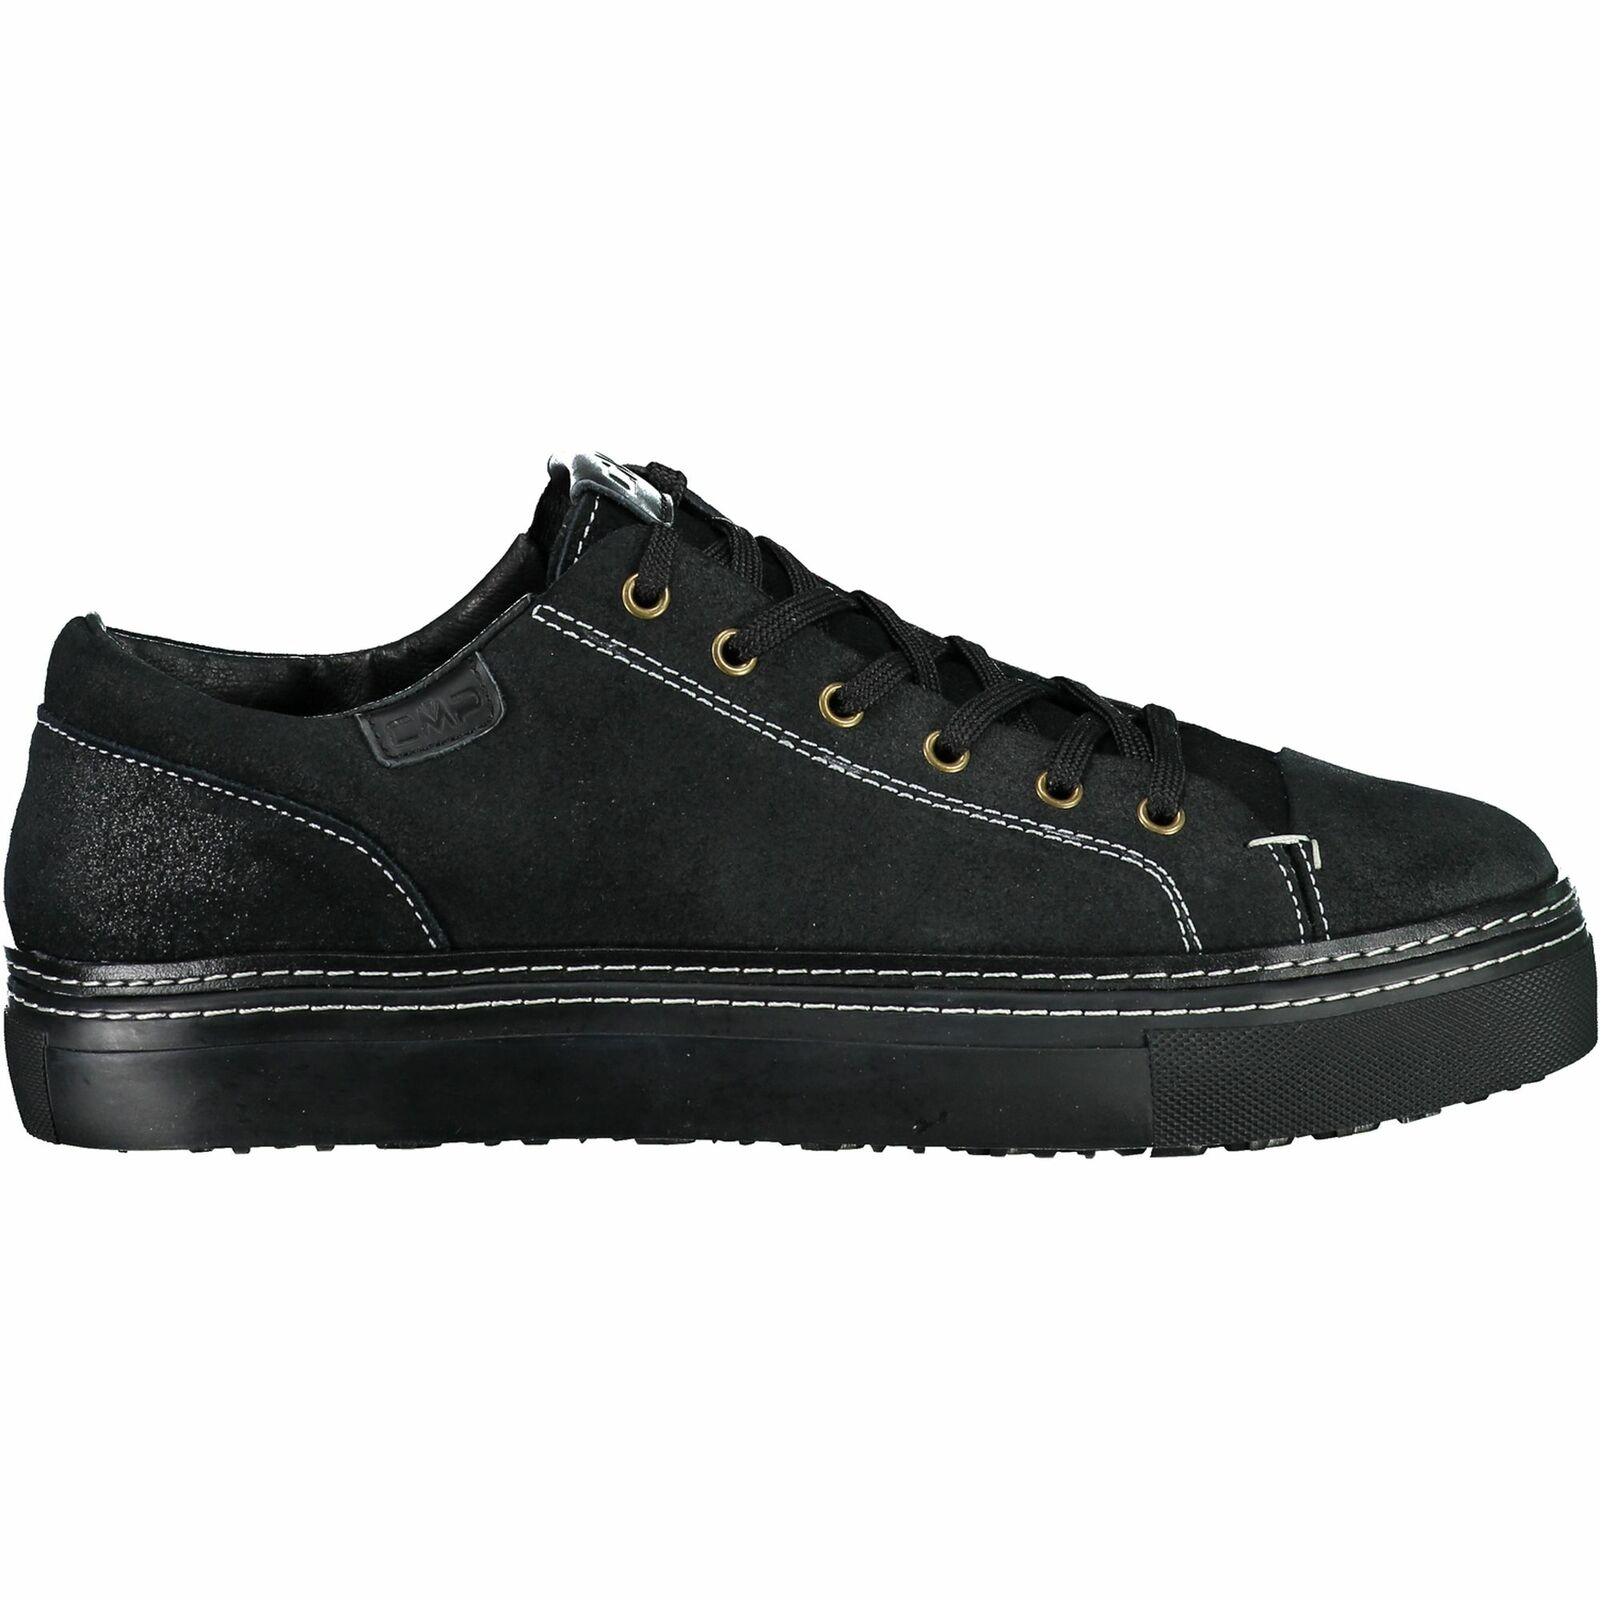 CMP paniers Libertas Lifestyle Chaussure Noir UniCouleure Cuir Sauvage